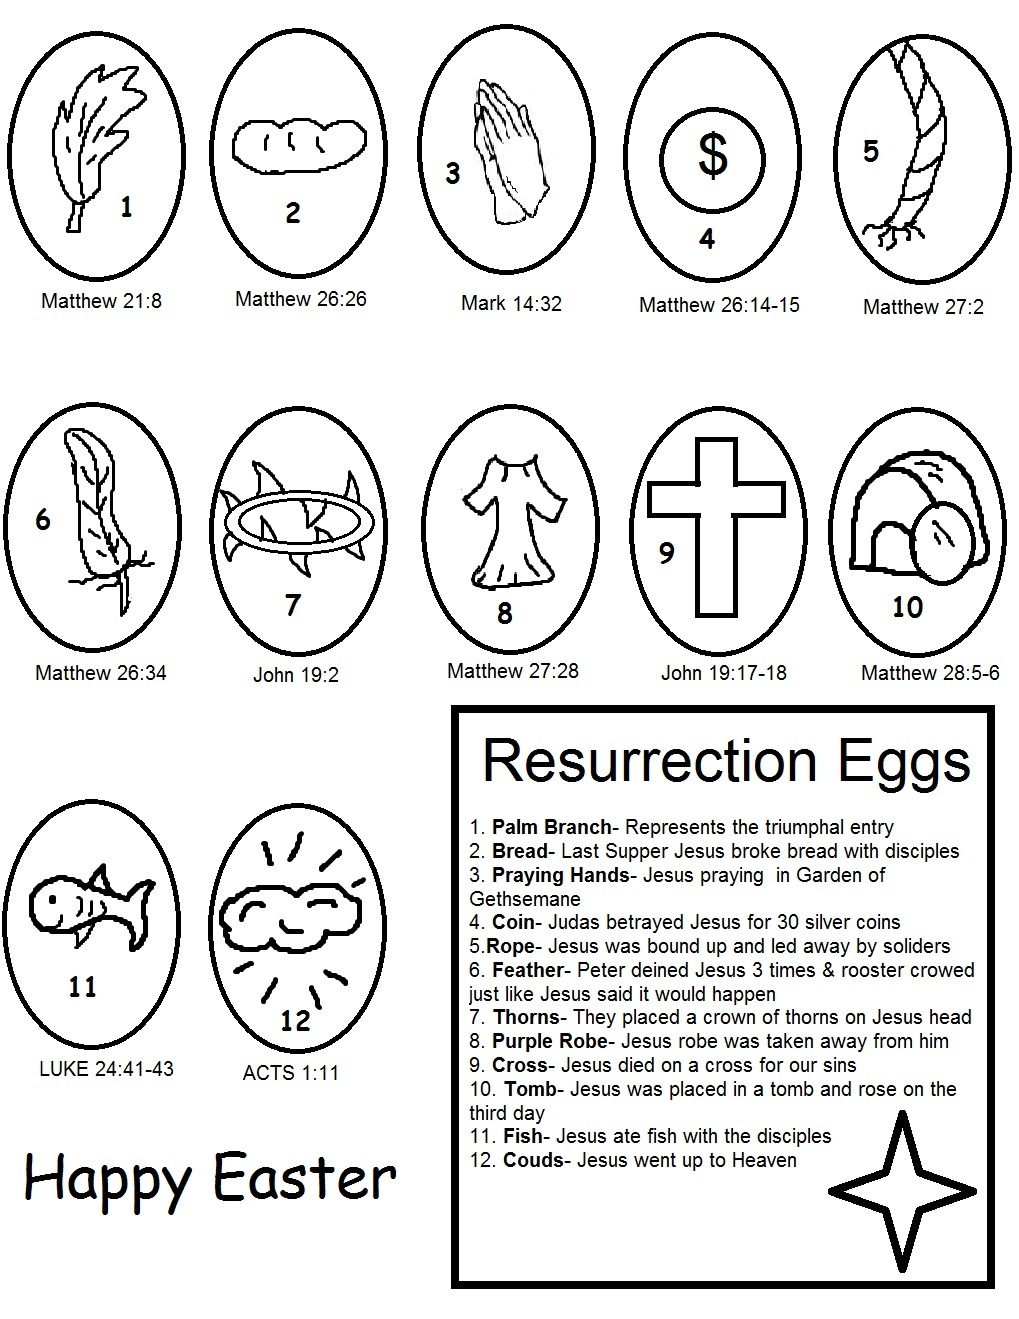 Church House Collection Blog: Easter Resurrection Eggs